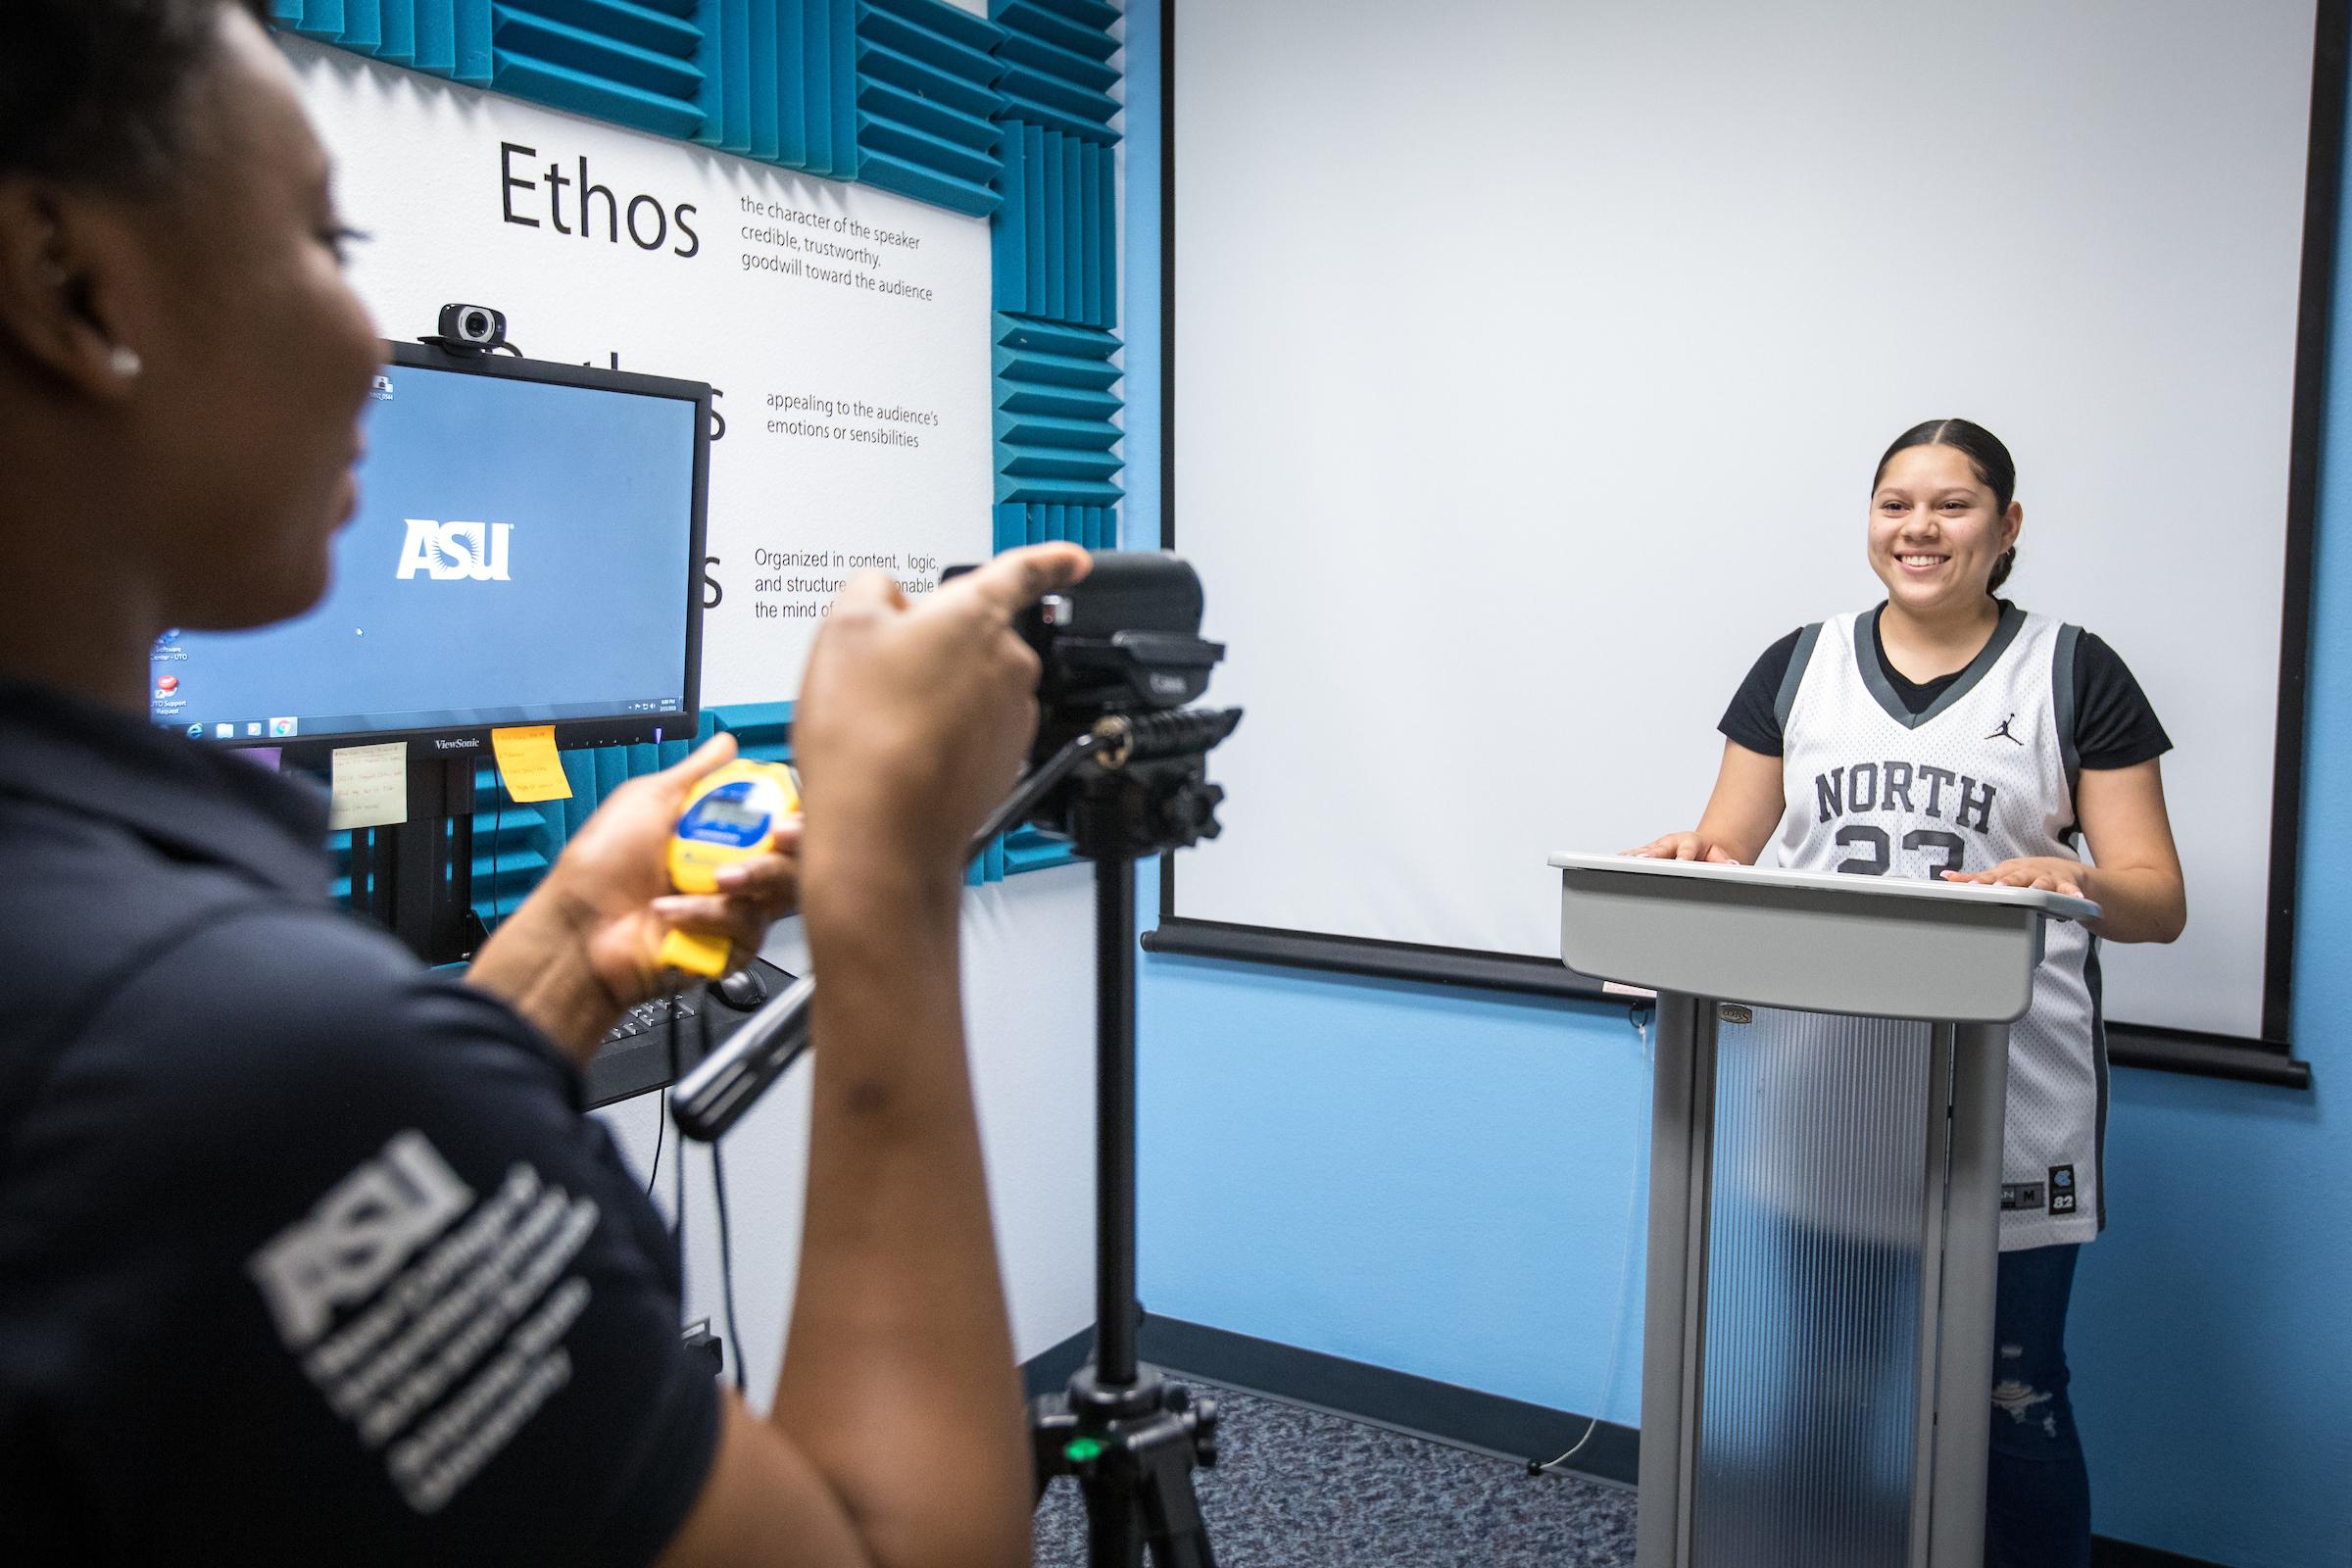 student filming woman speaking